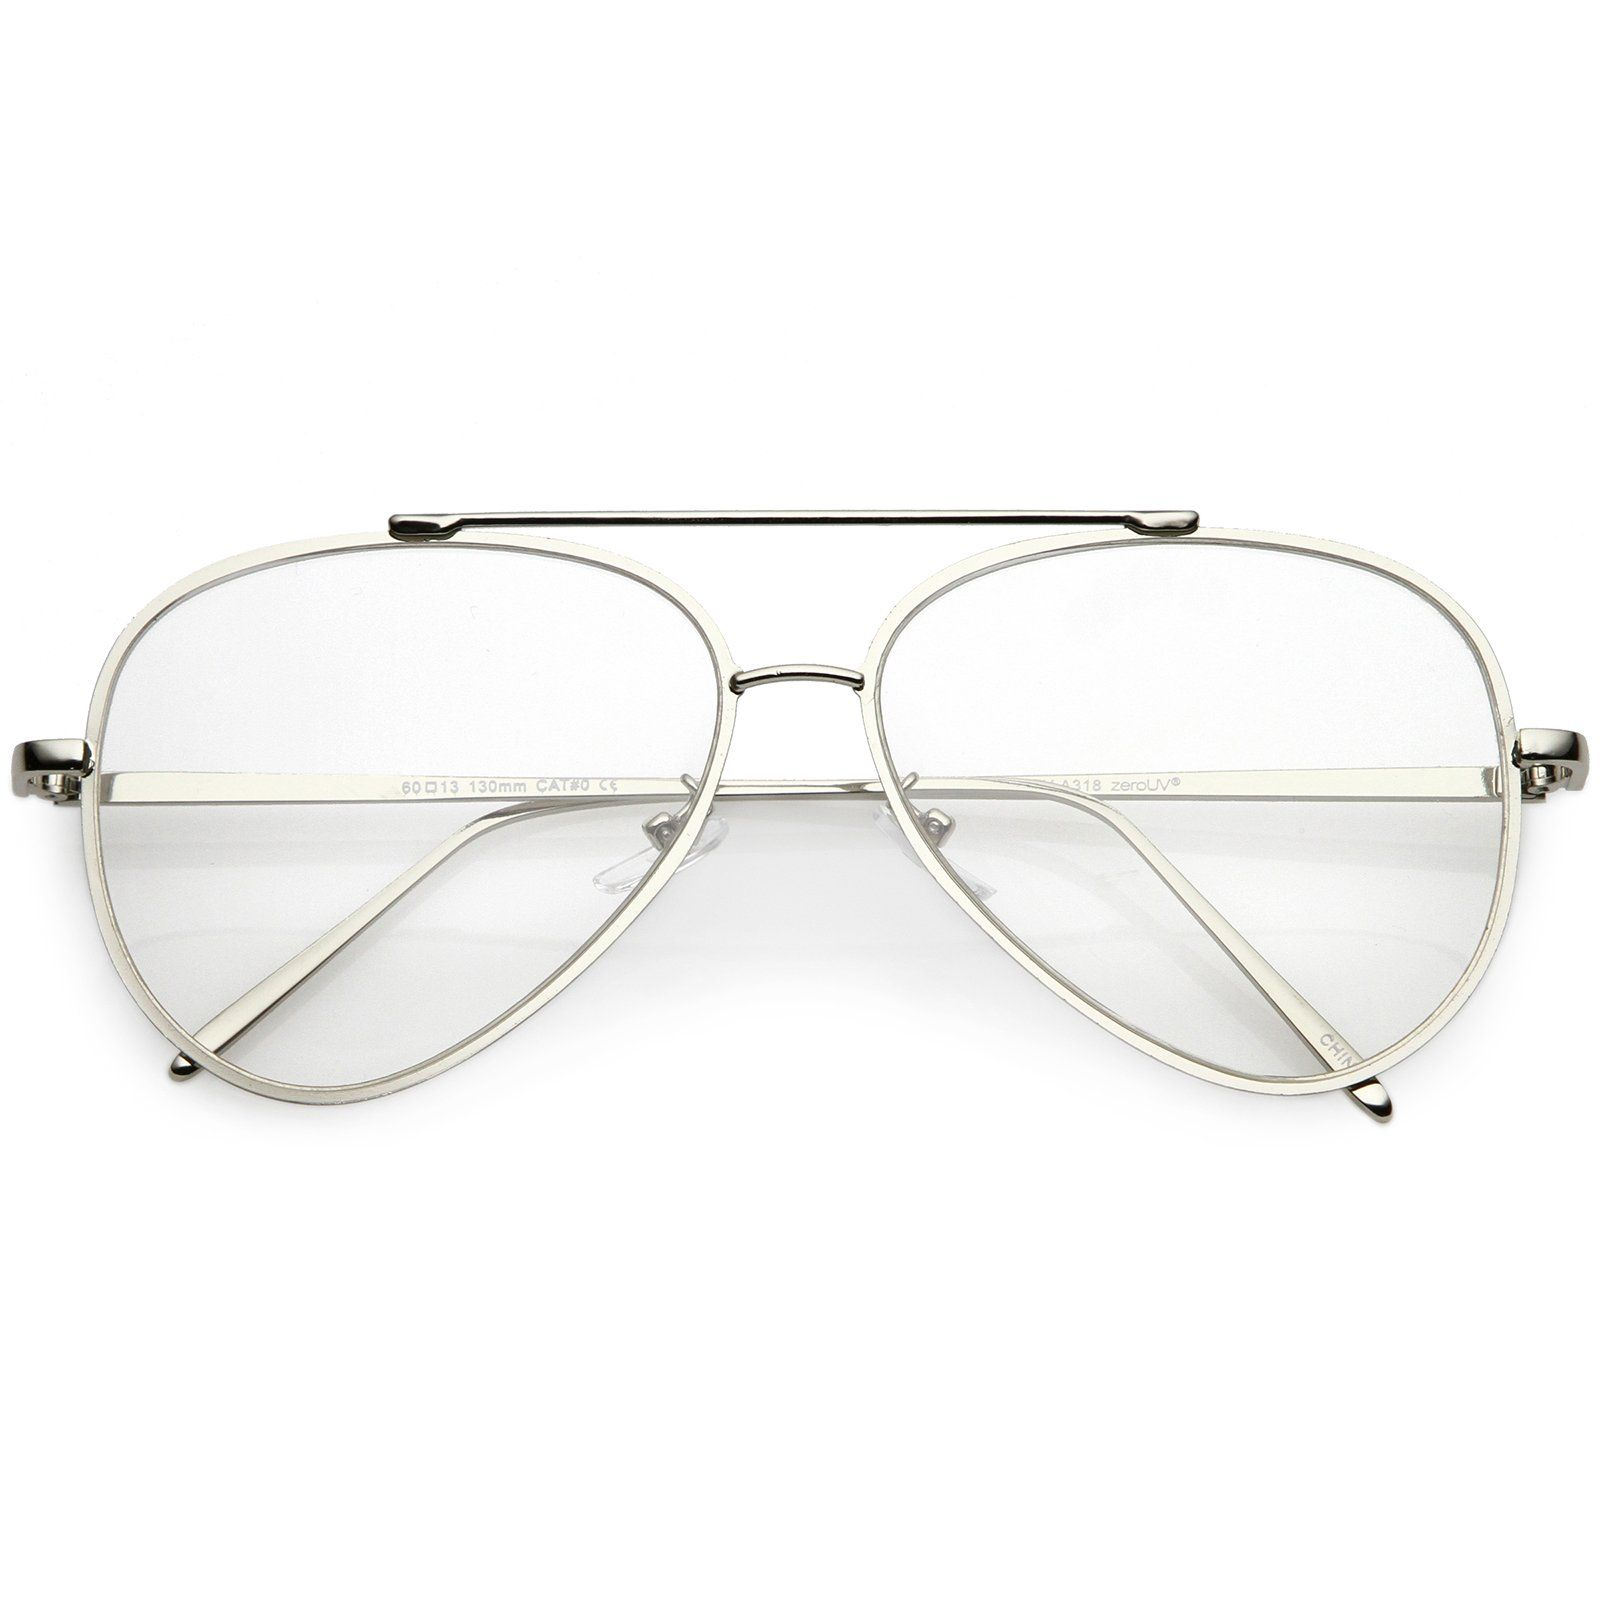 4d501cf981 Mod Fashion Metal Aviator Eyeglasses Teardrop Rimless Clear Flat Lens 58mm